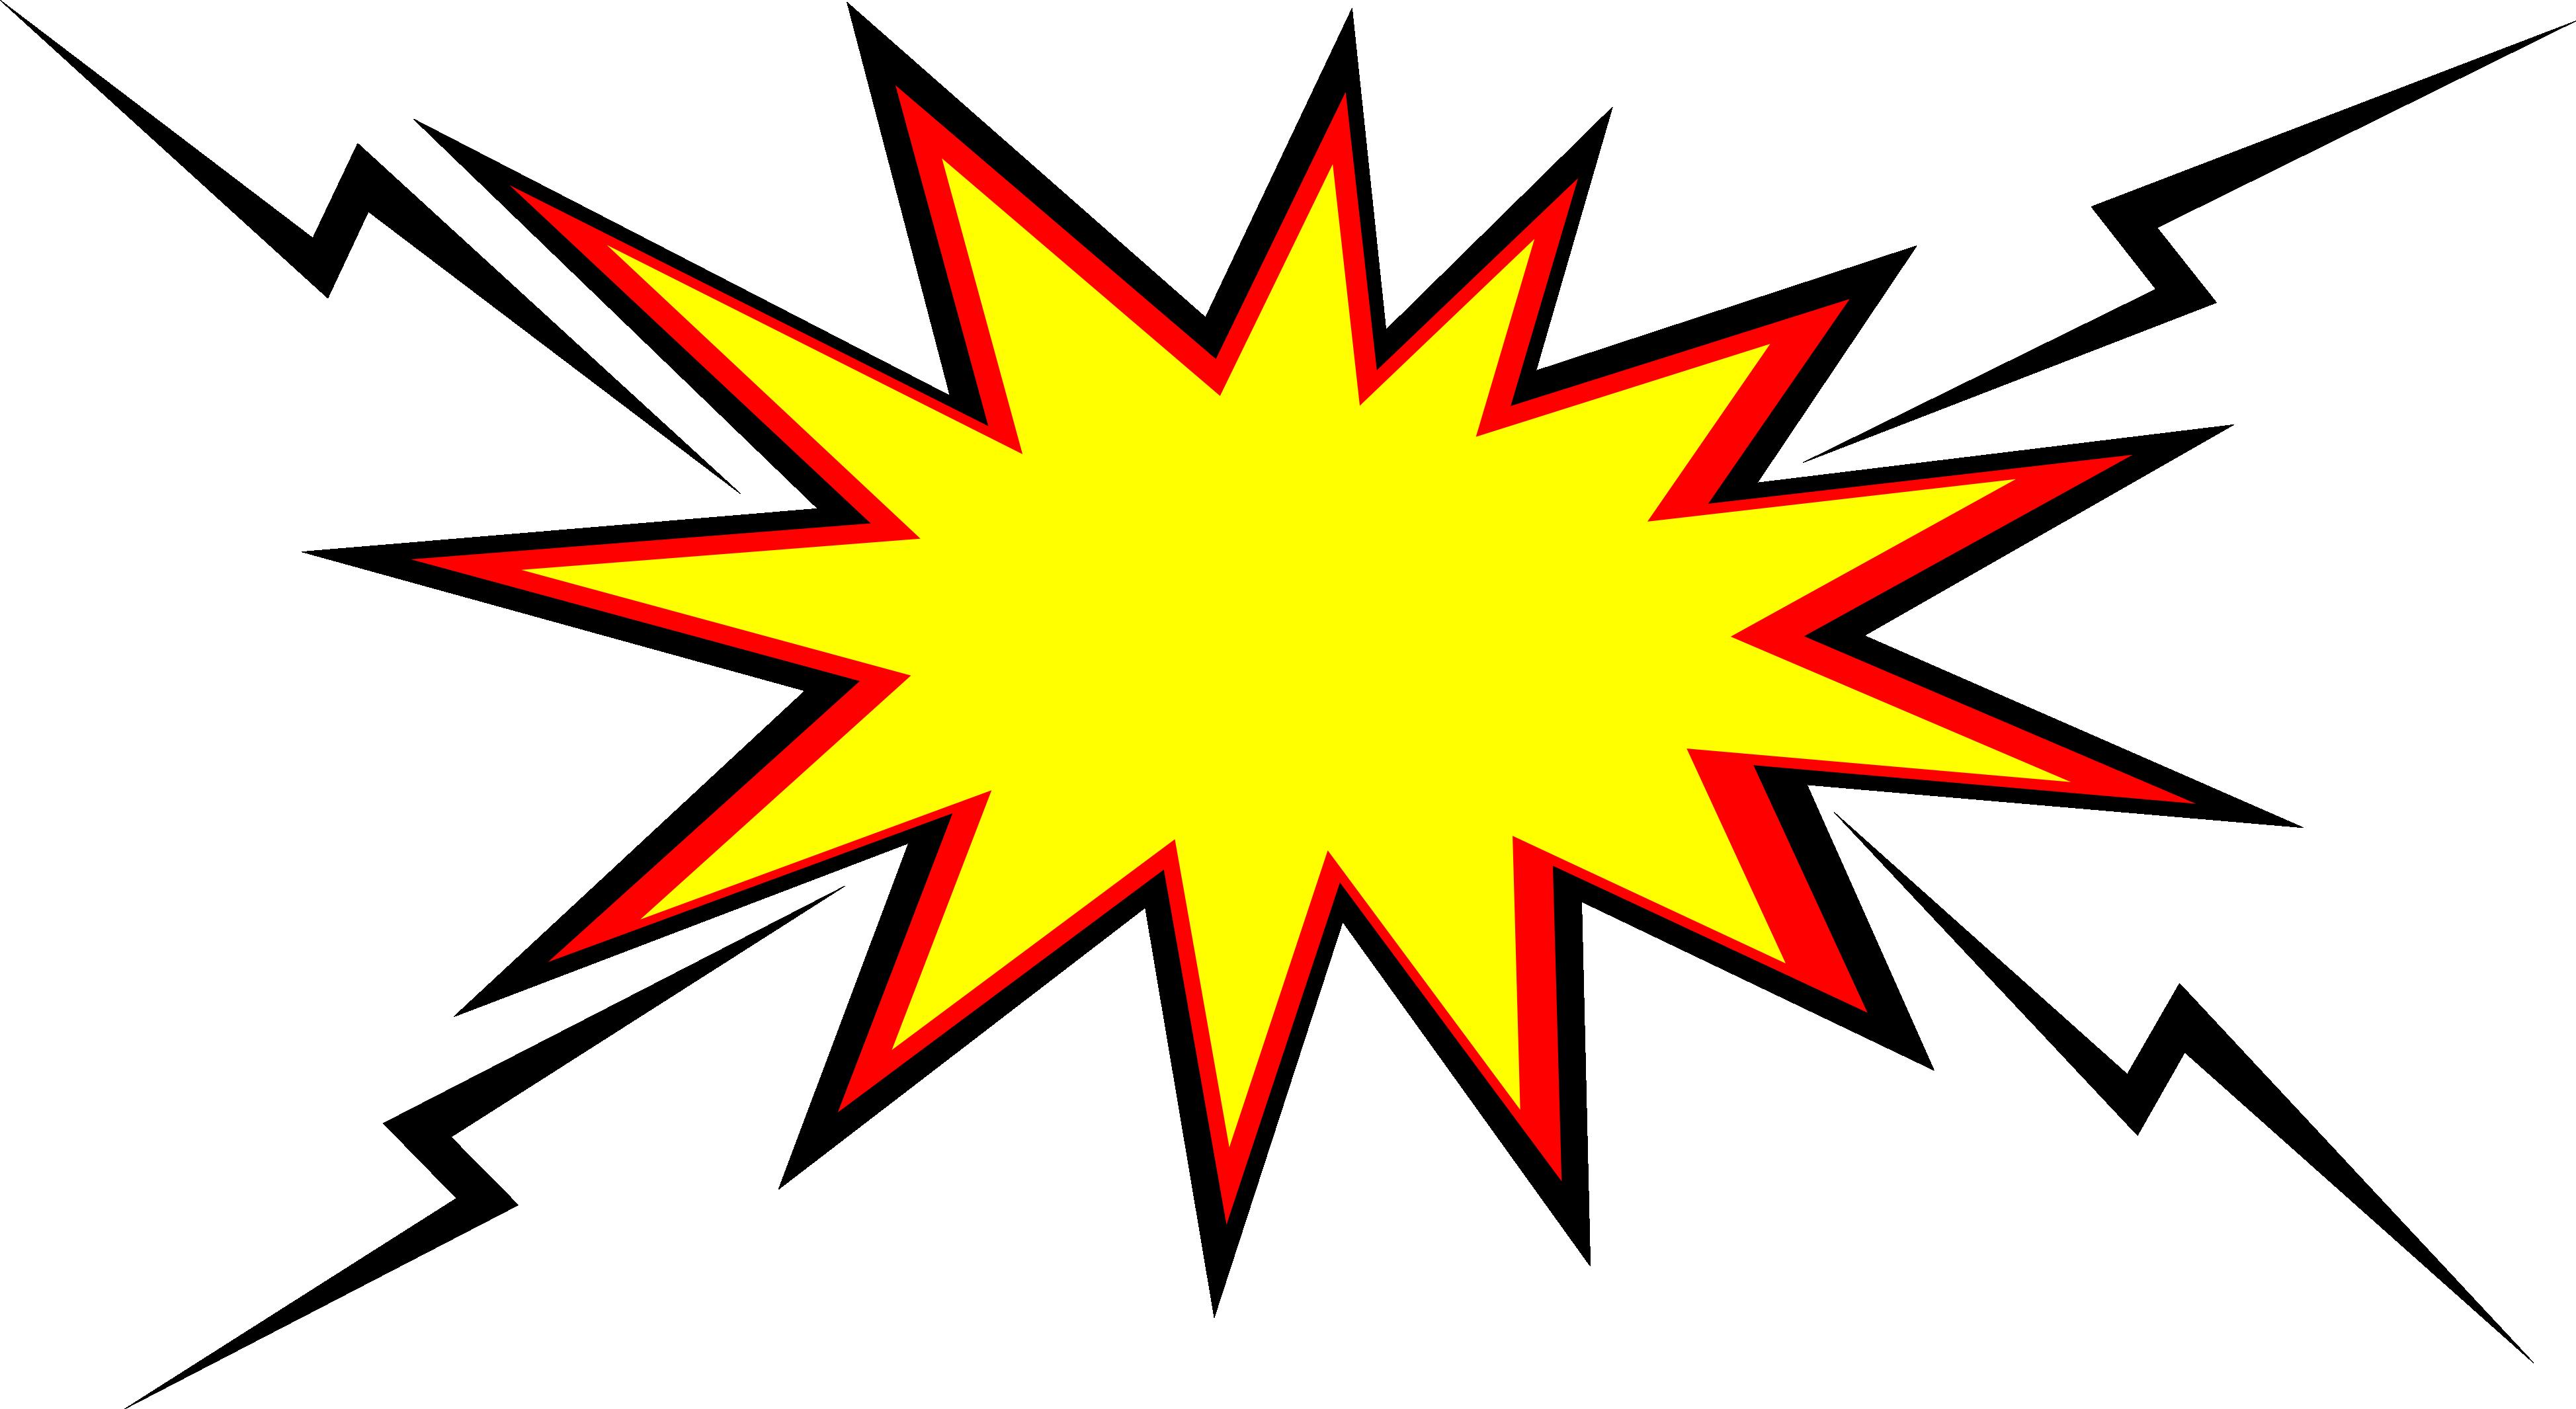 20 comic boom explosion vector png transparent svg vol 2 onlygfx com 20 comic boom explosion vector png